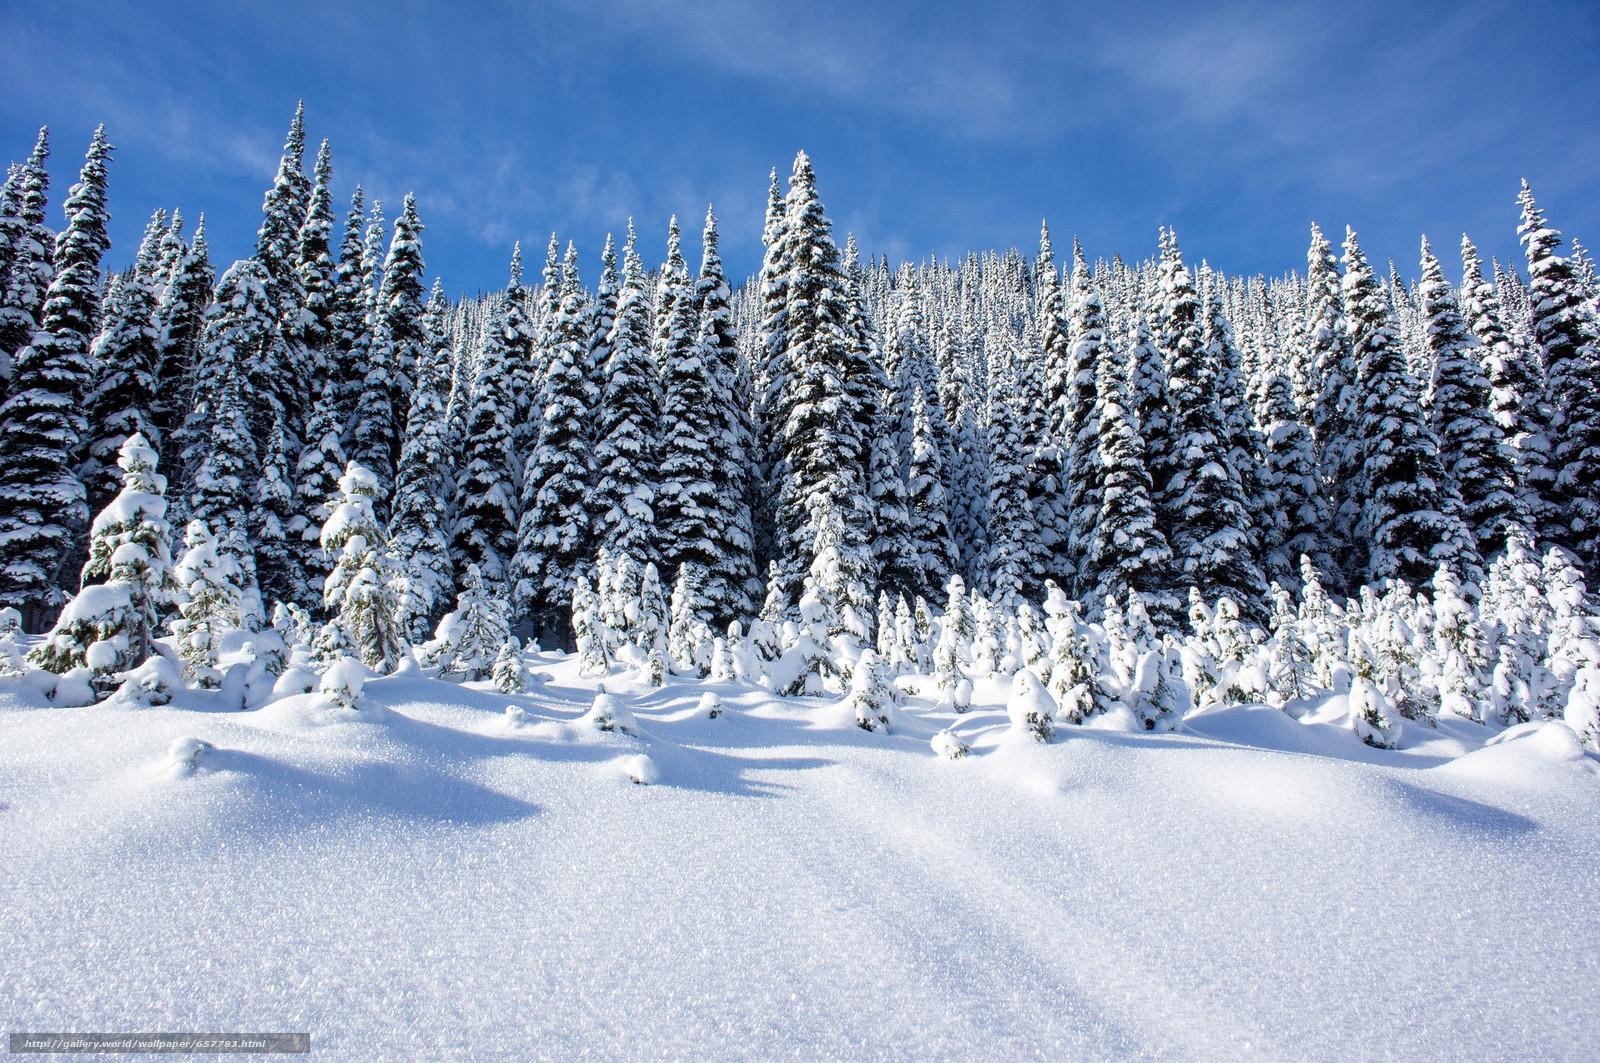 winter, snow, drifts, trees, landscape